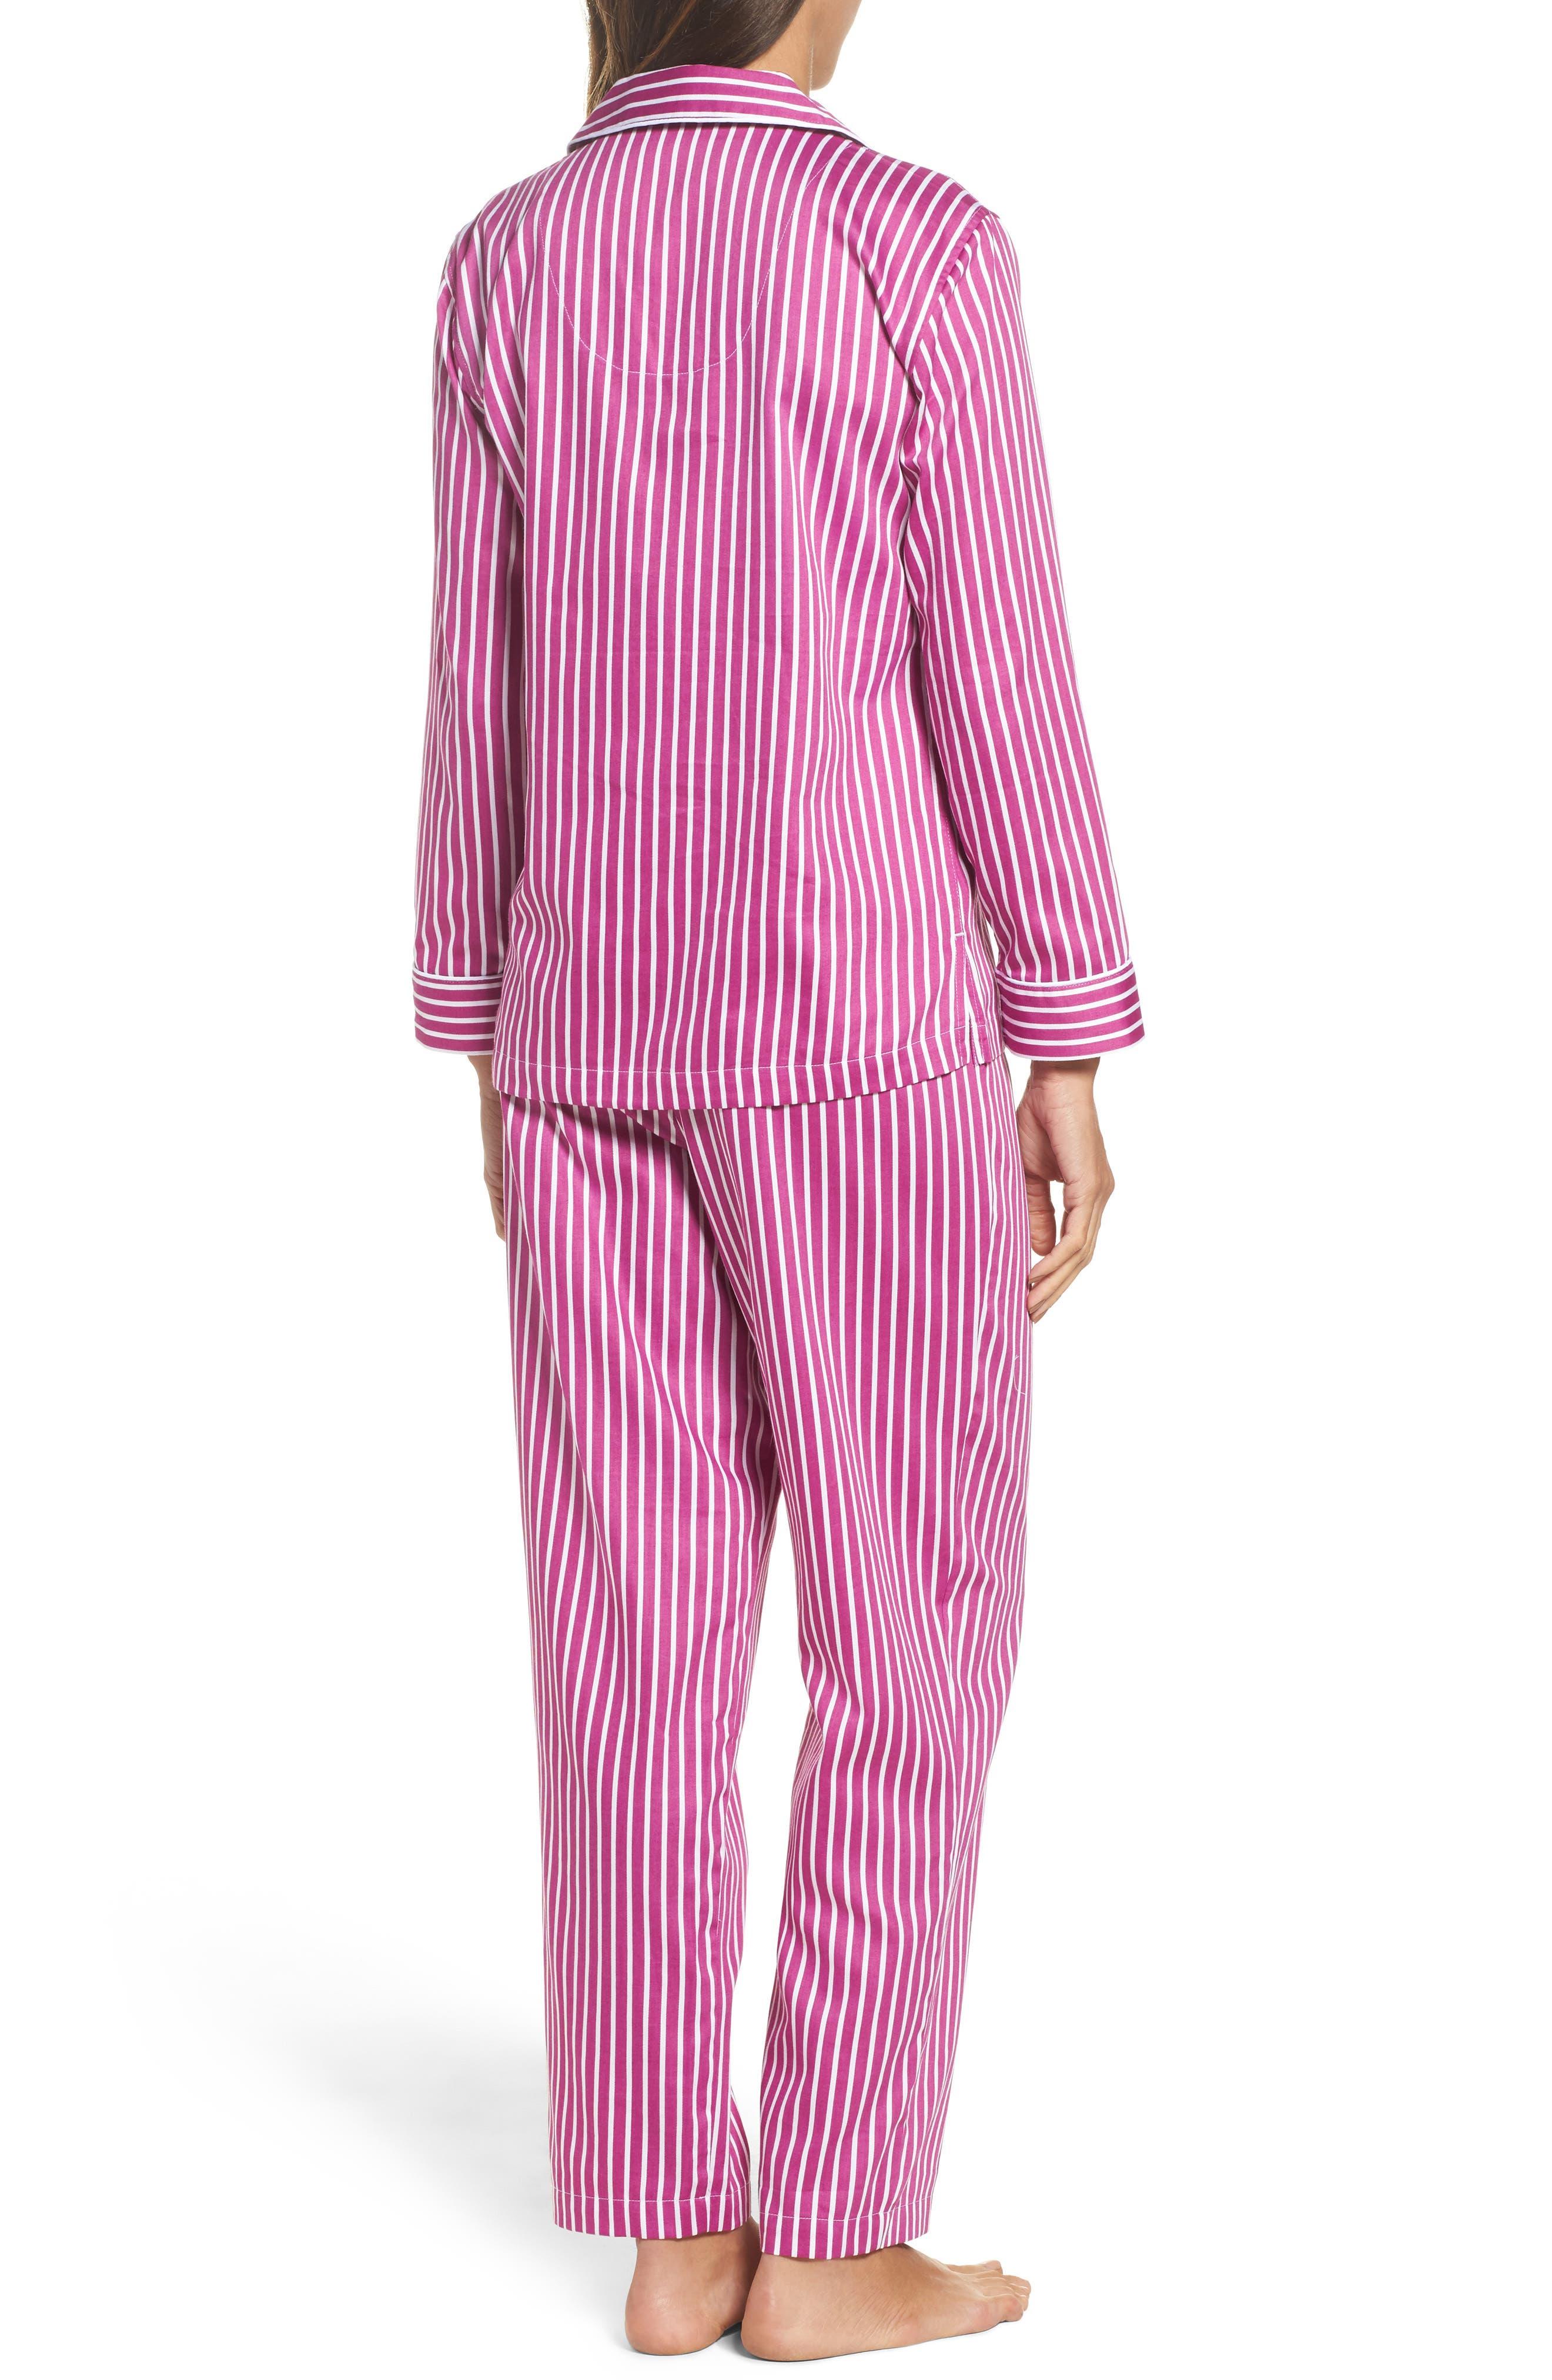 Notch Collar Pajamas,                             Alternate thumbnail 2, color,                             Pink/ White Stripe